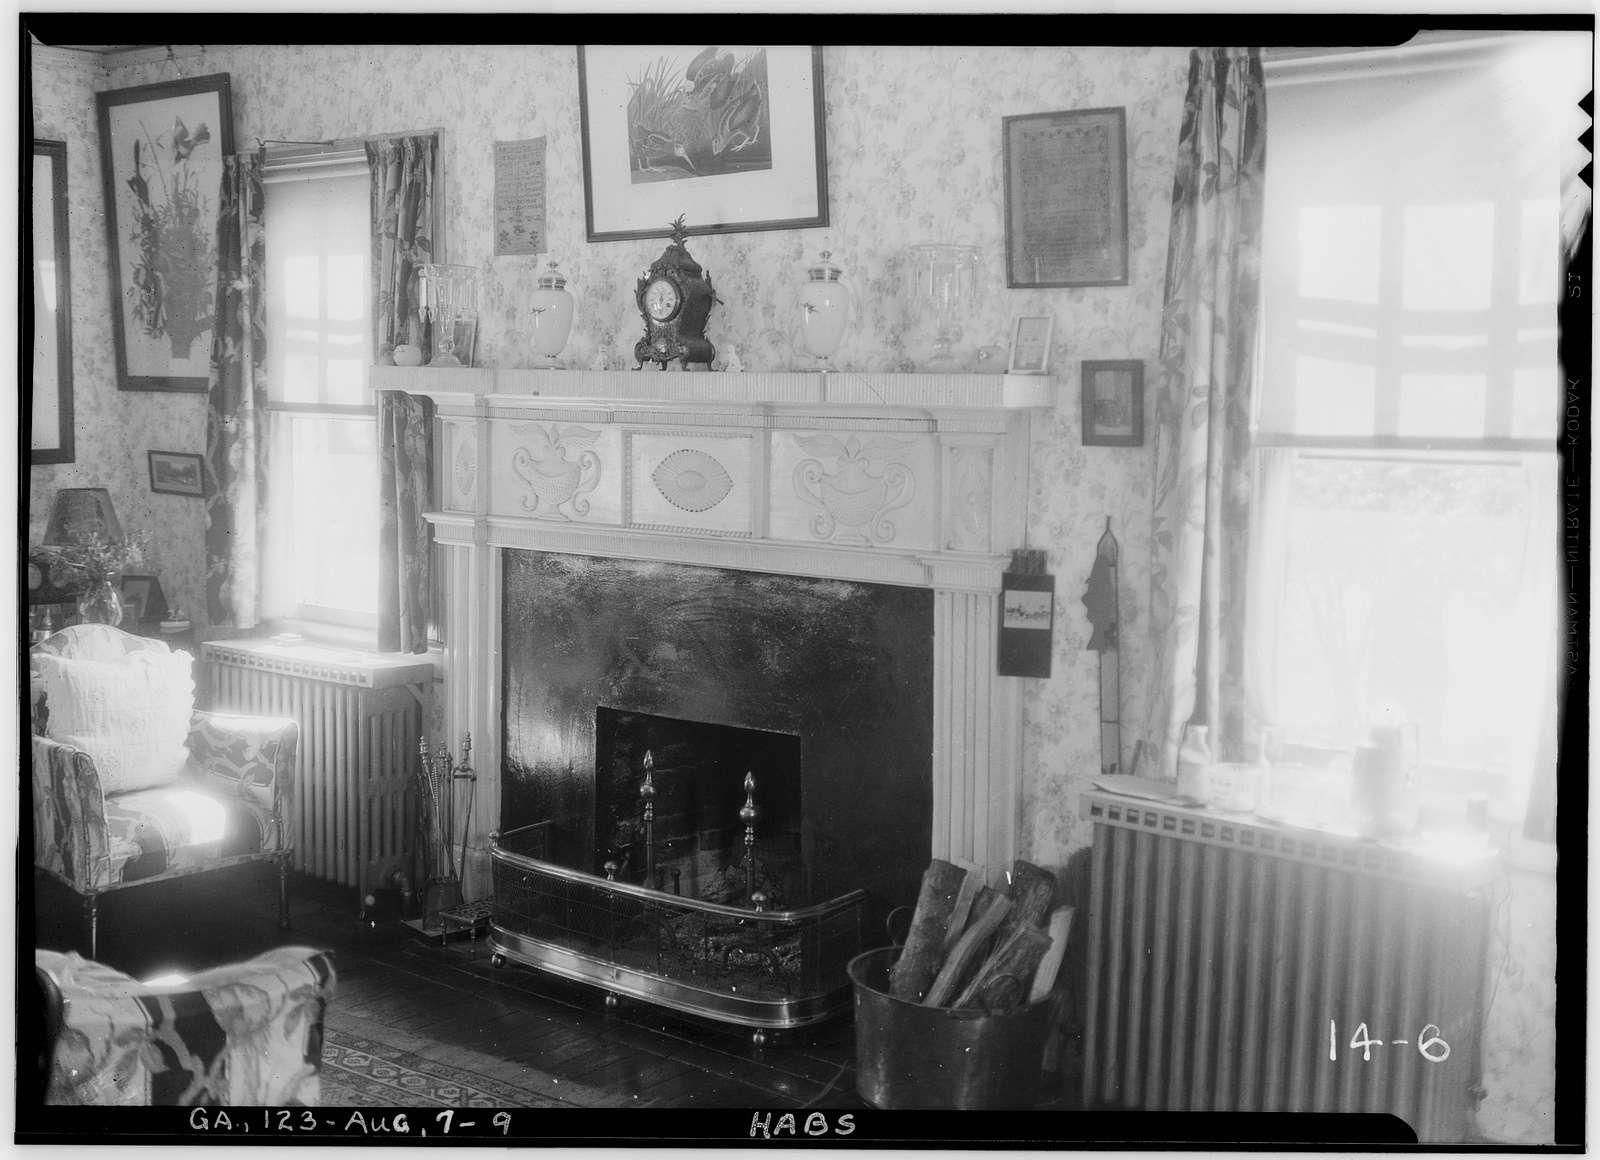 Chafee House, 914 Milledge Road, Augusta, Richmond County, GA